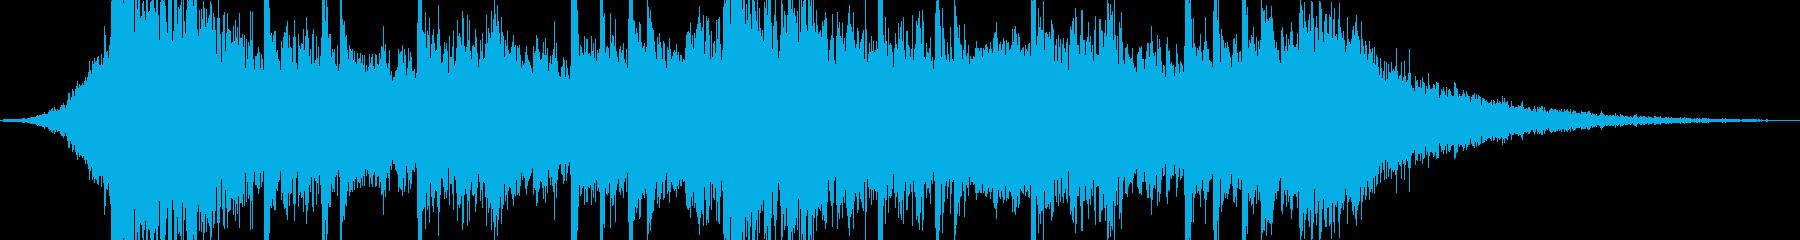 Hollywood Orchestra 2の再生済みの波形